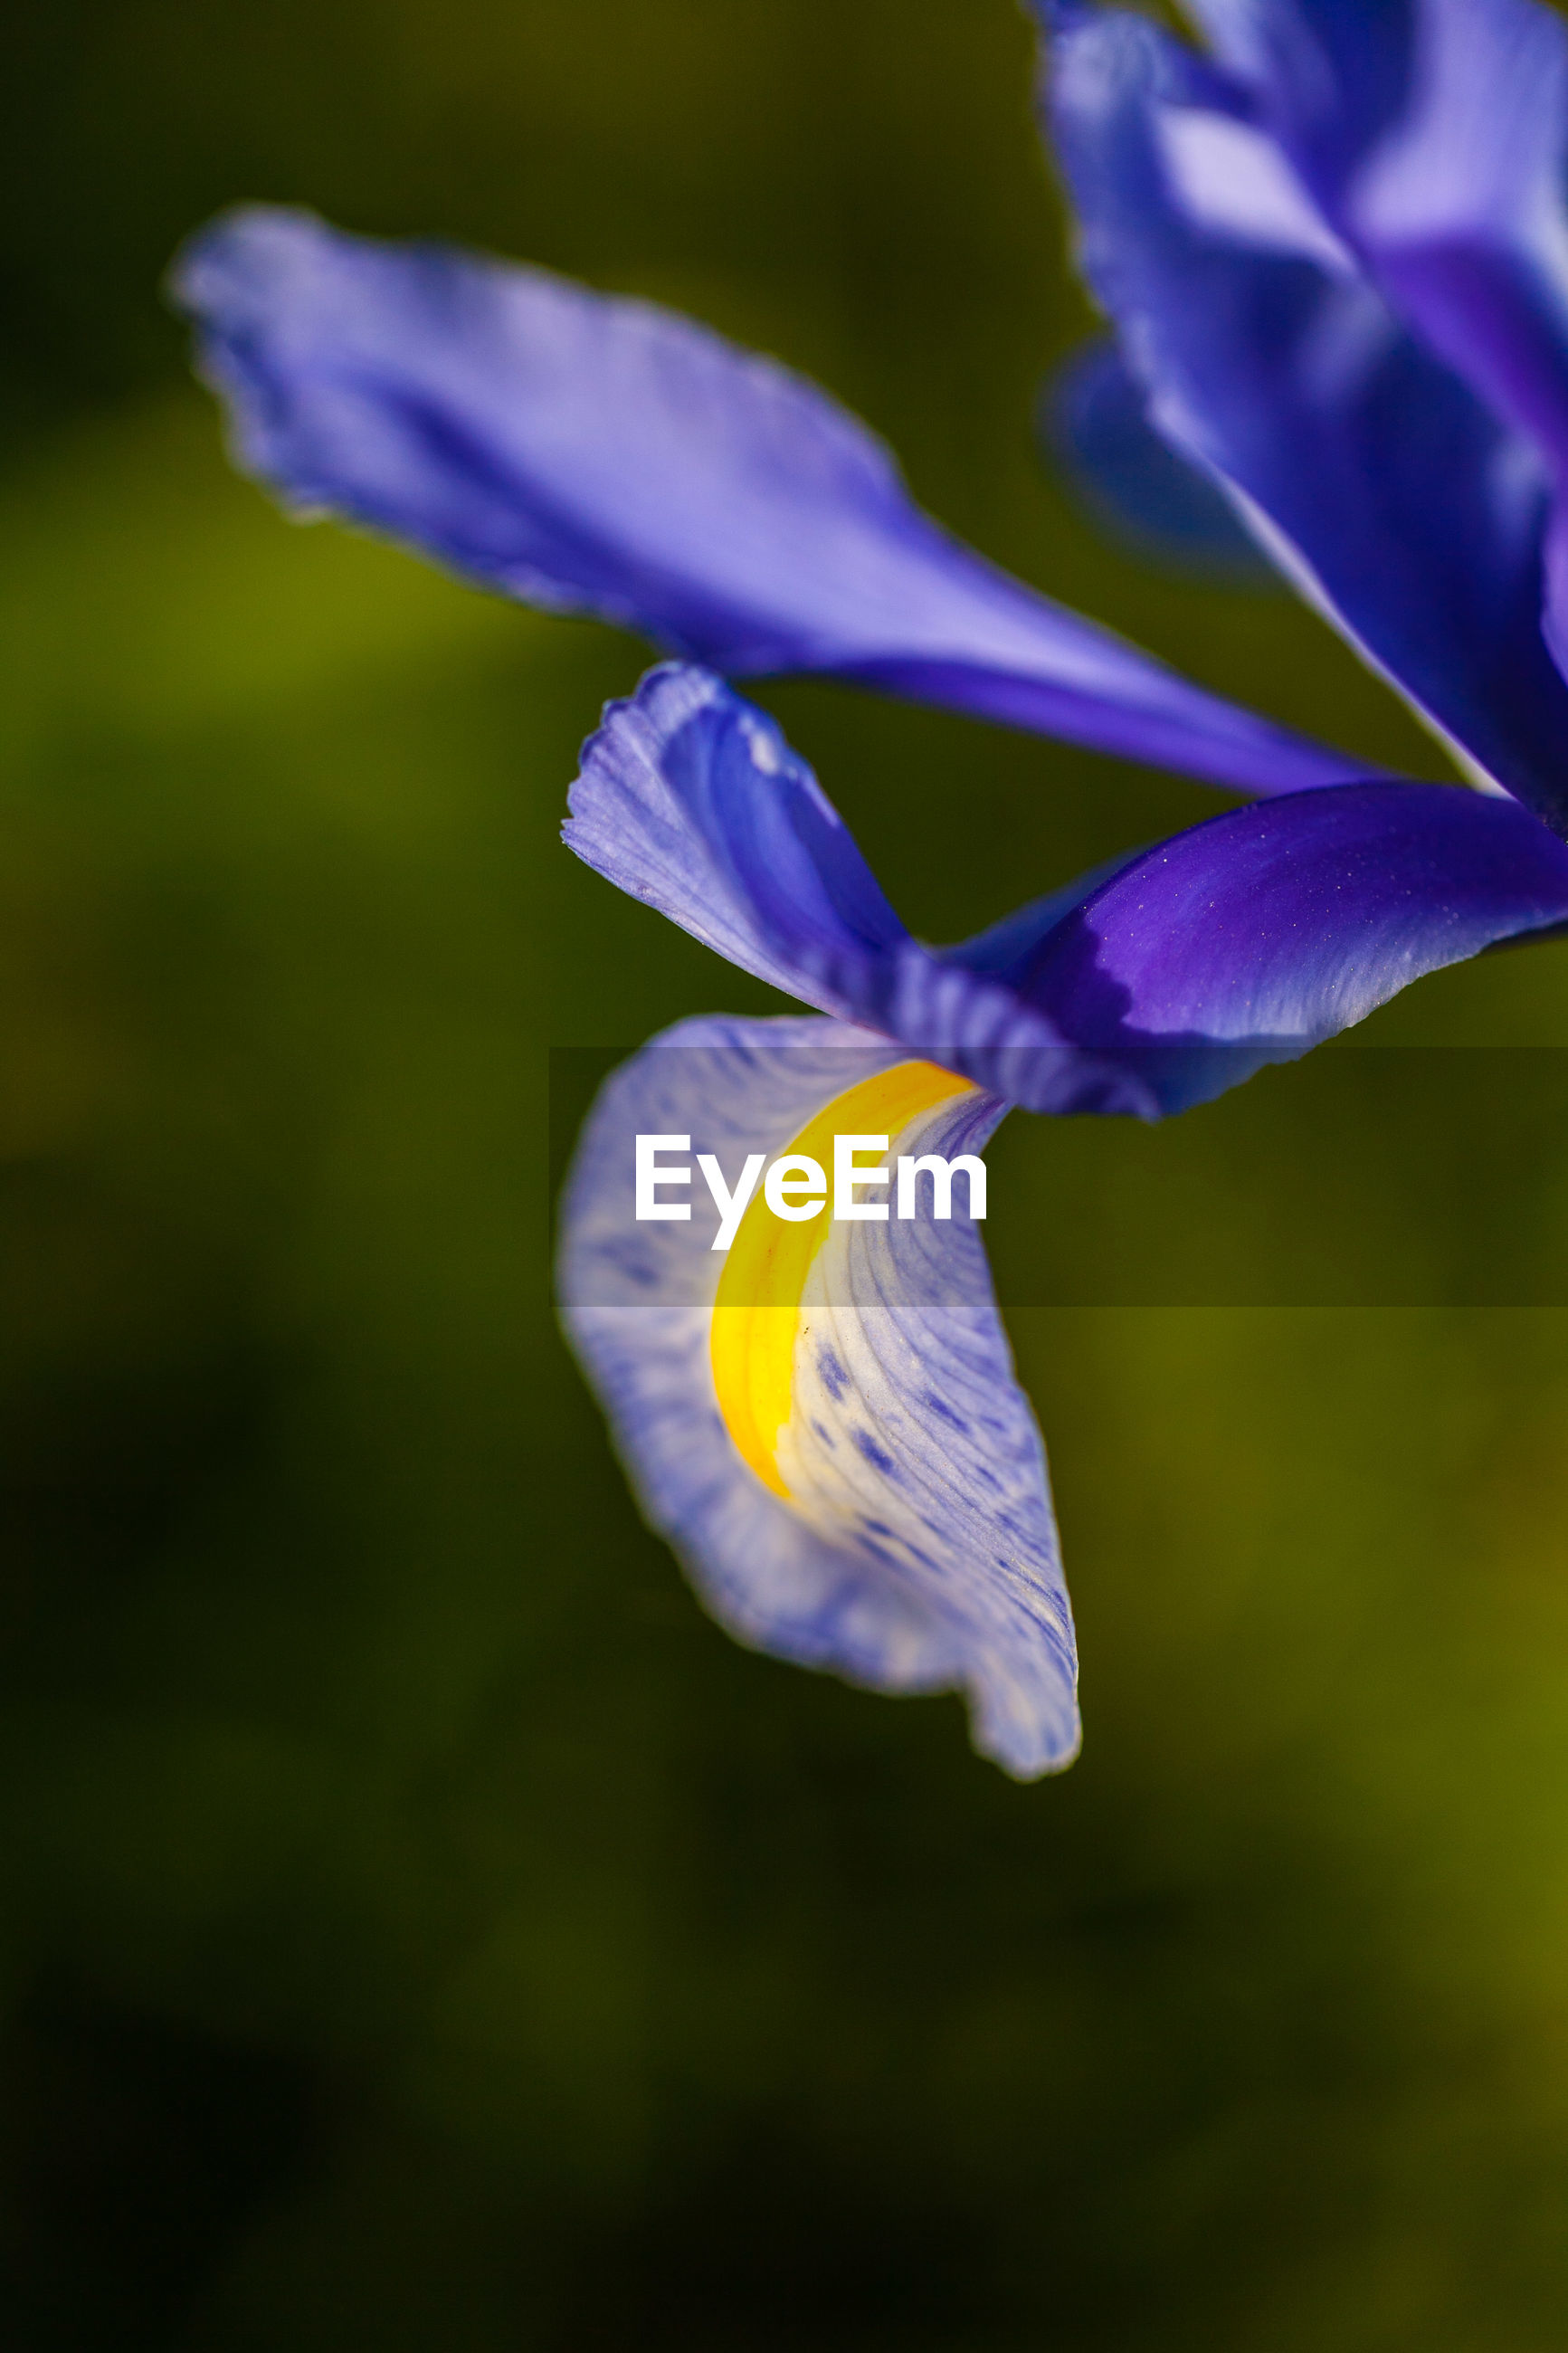 CLOSE-UP OF YELLOW IRIS FLOWER